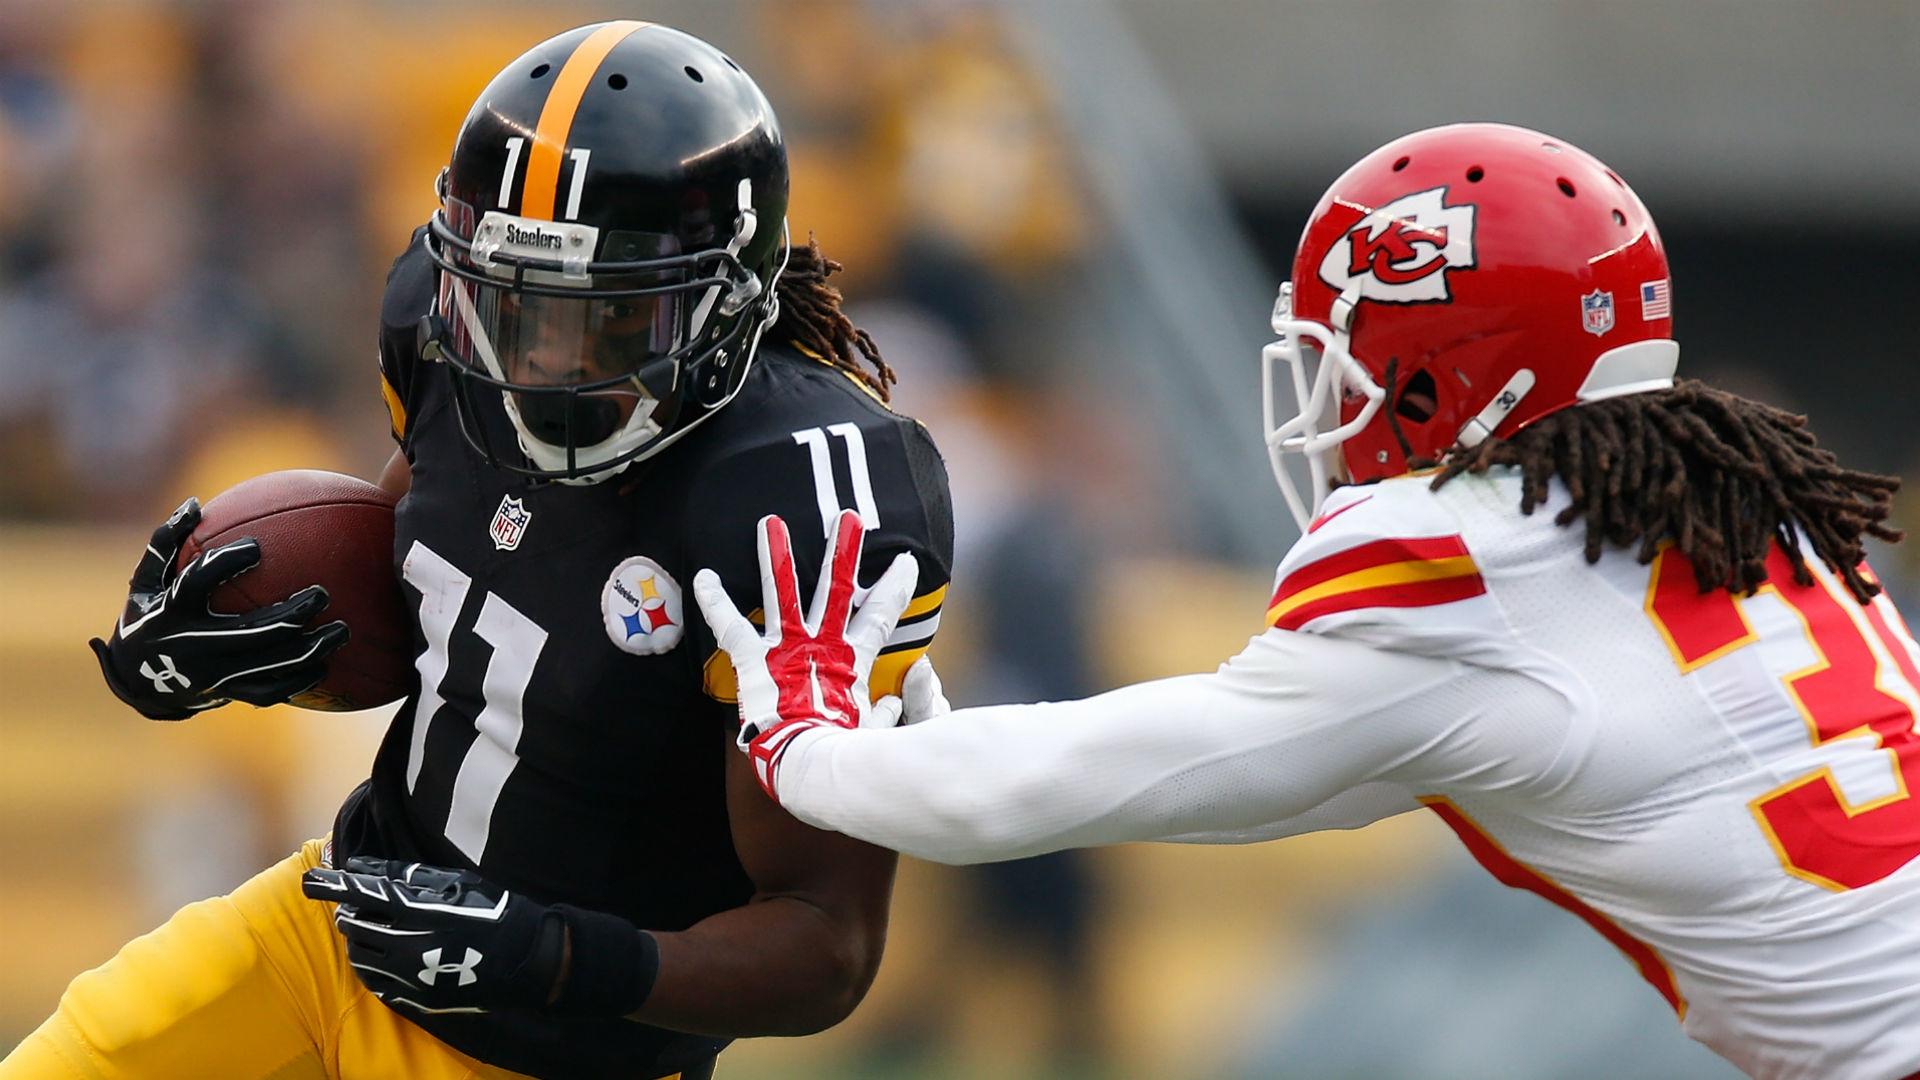 Ben Roethlisberger thinks Markus Wheaton is Steelers' 'breakout player'